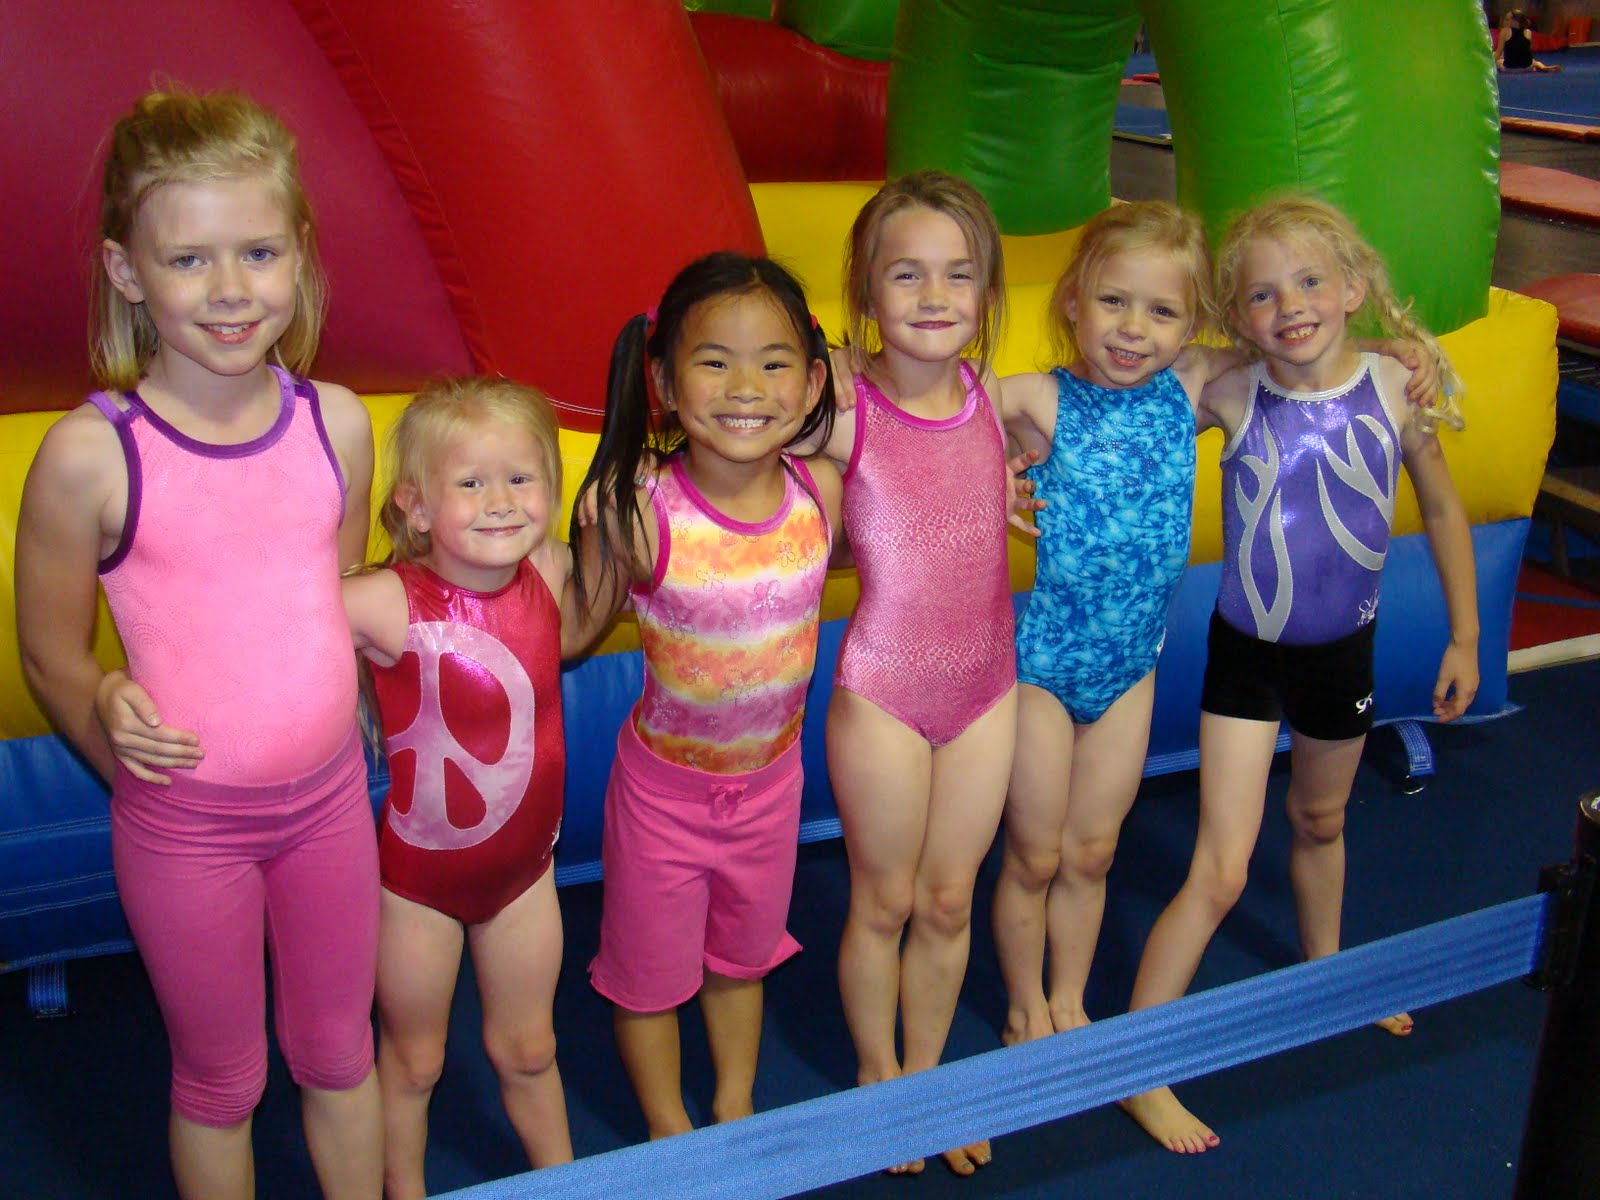 10 Year Old Practicing Gymnastics – Wonderful Image Gallery